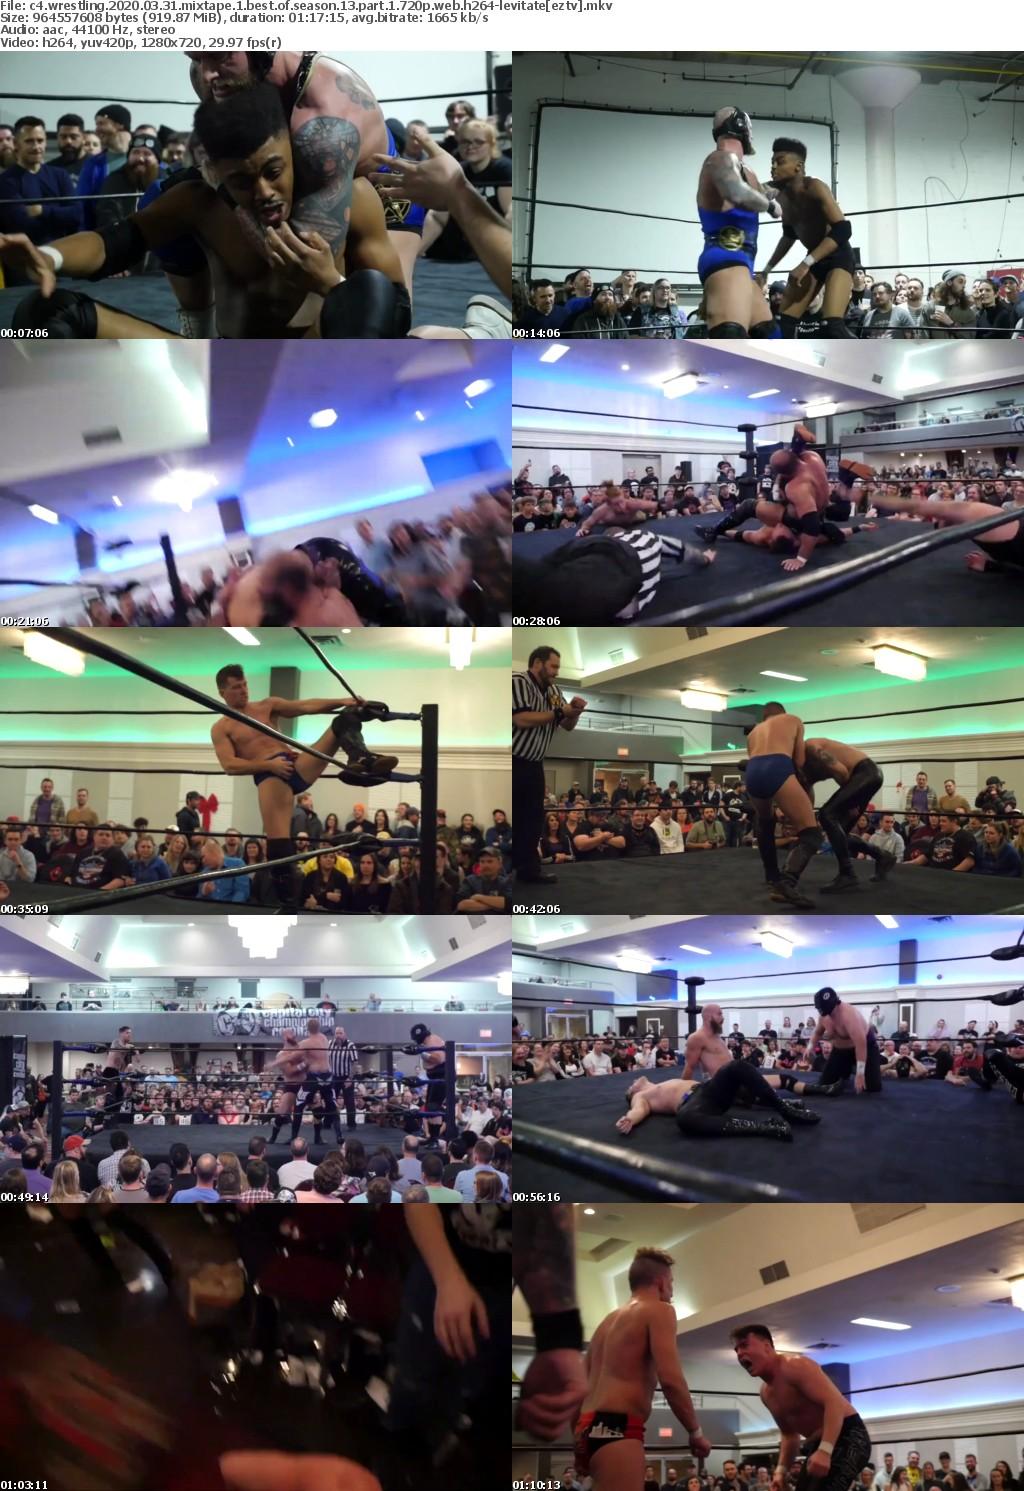 C4 Wrestling 2020 03 31 Mixtape 1 Best Of Season 13 Part 1 720p WEB H264-LEViTATE